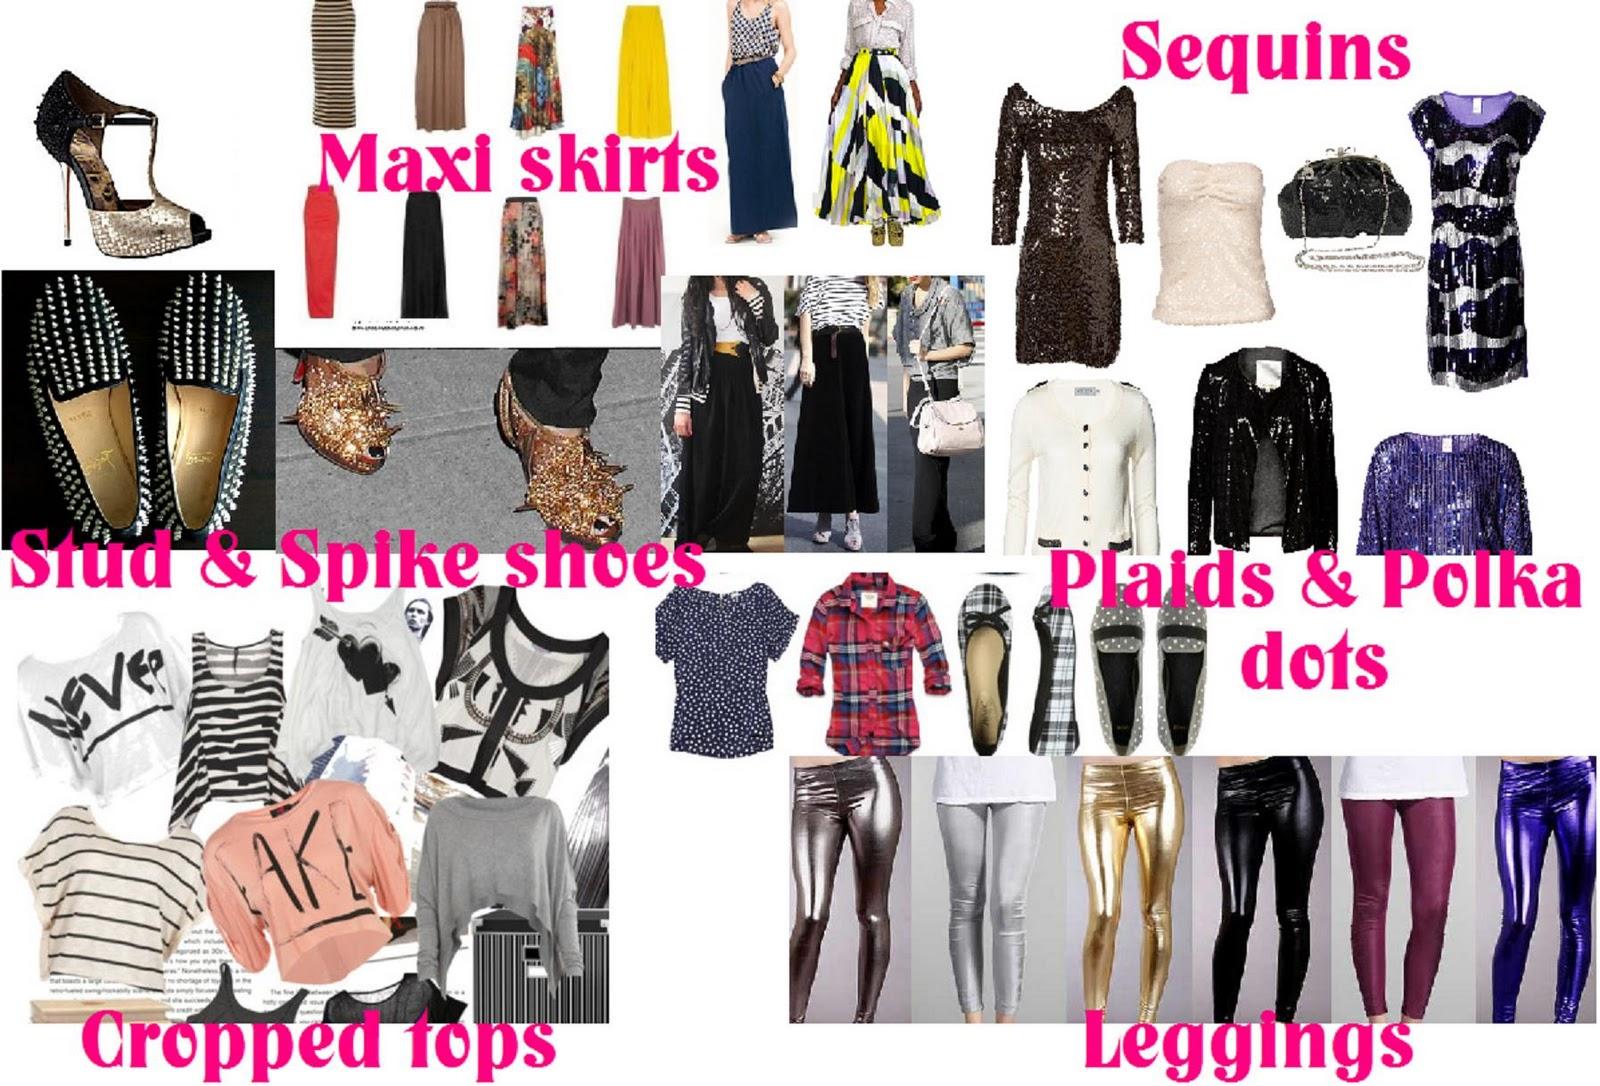 http://1.bp.blogspot.com/-9NHP19Z6bQ8/TwJWXsMBVsI/AAAAAAAAALM/-QPdRmrnEik/s1600/trends2011a.jpg